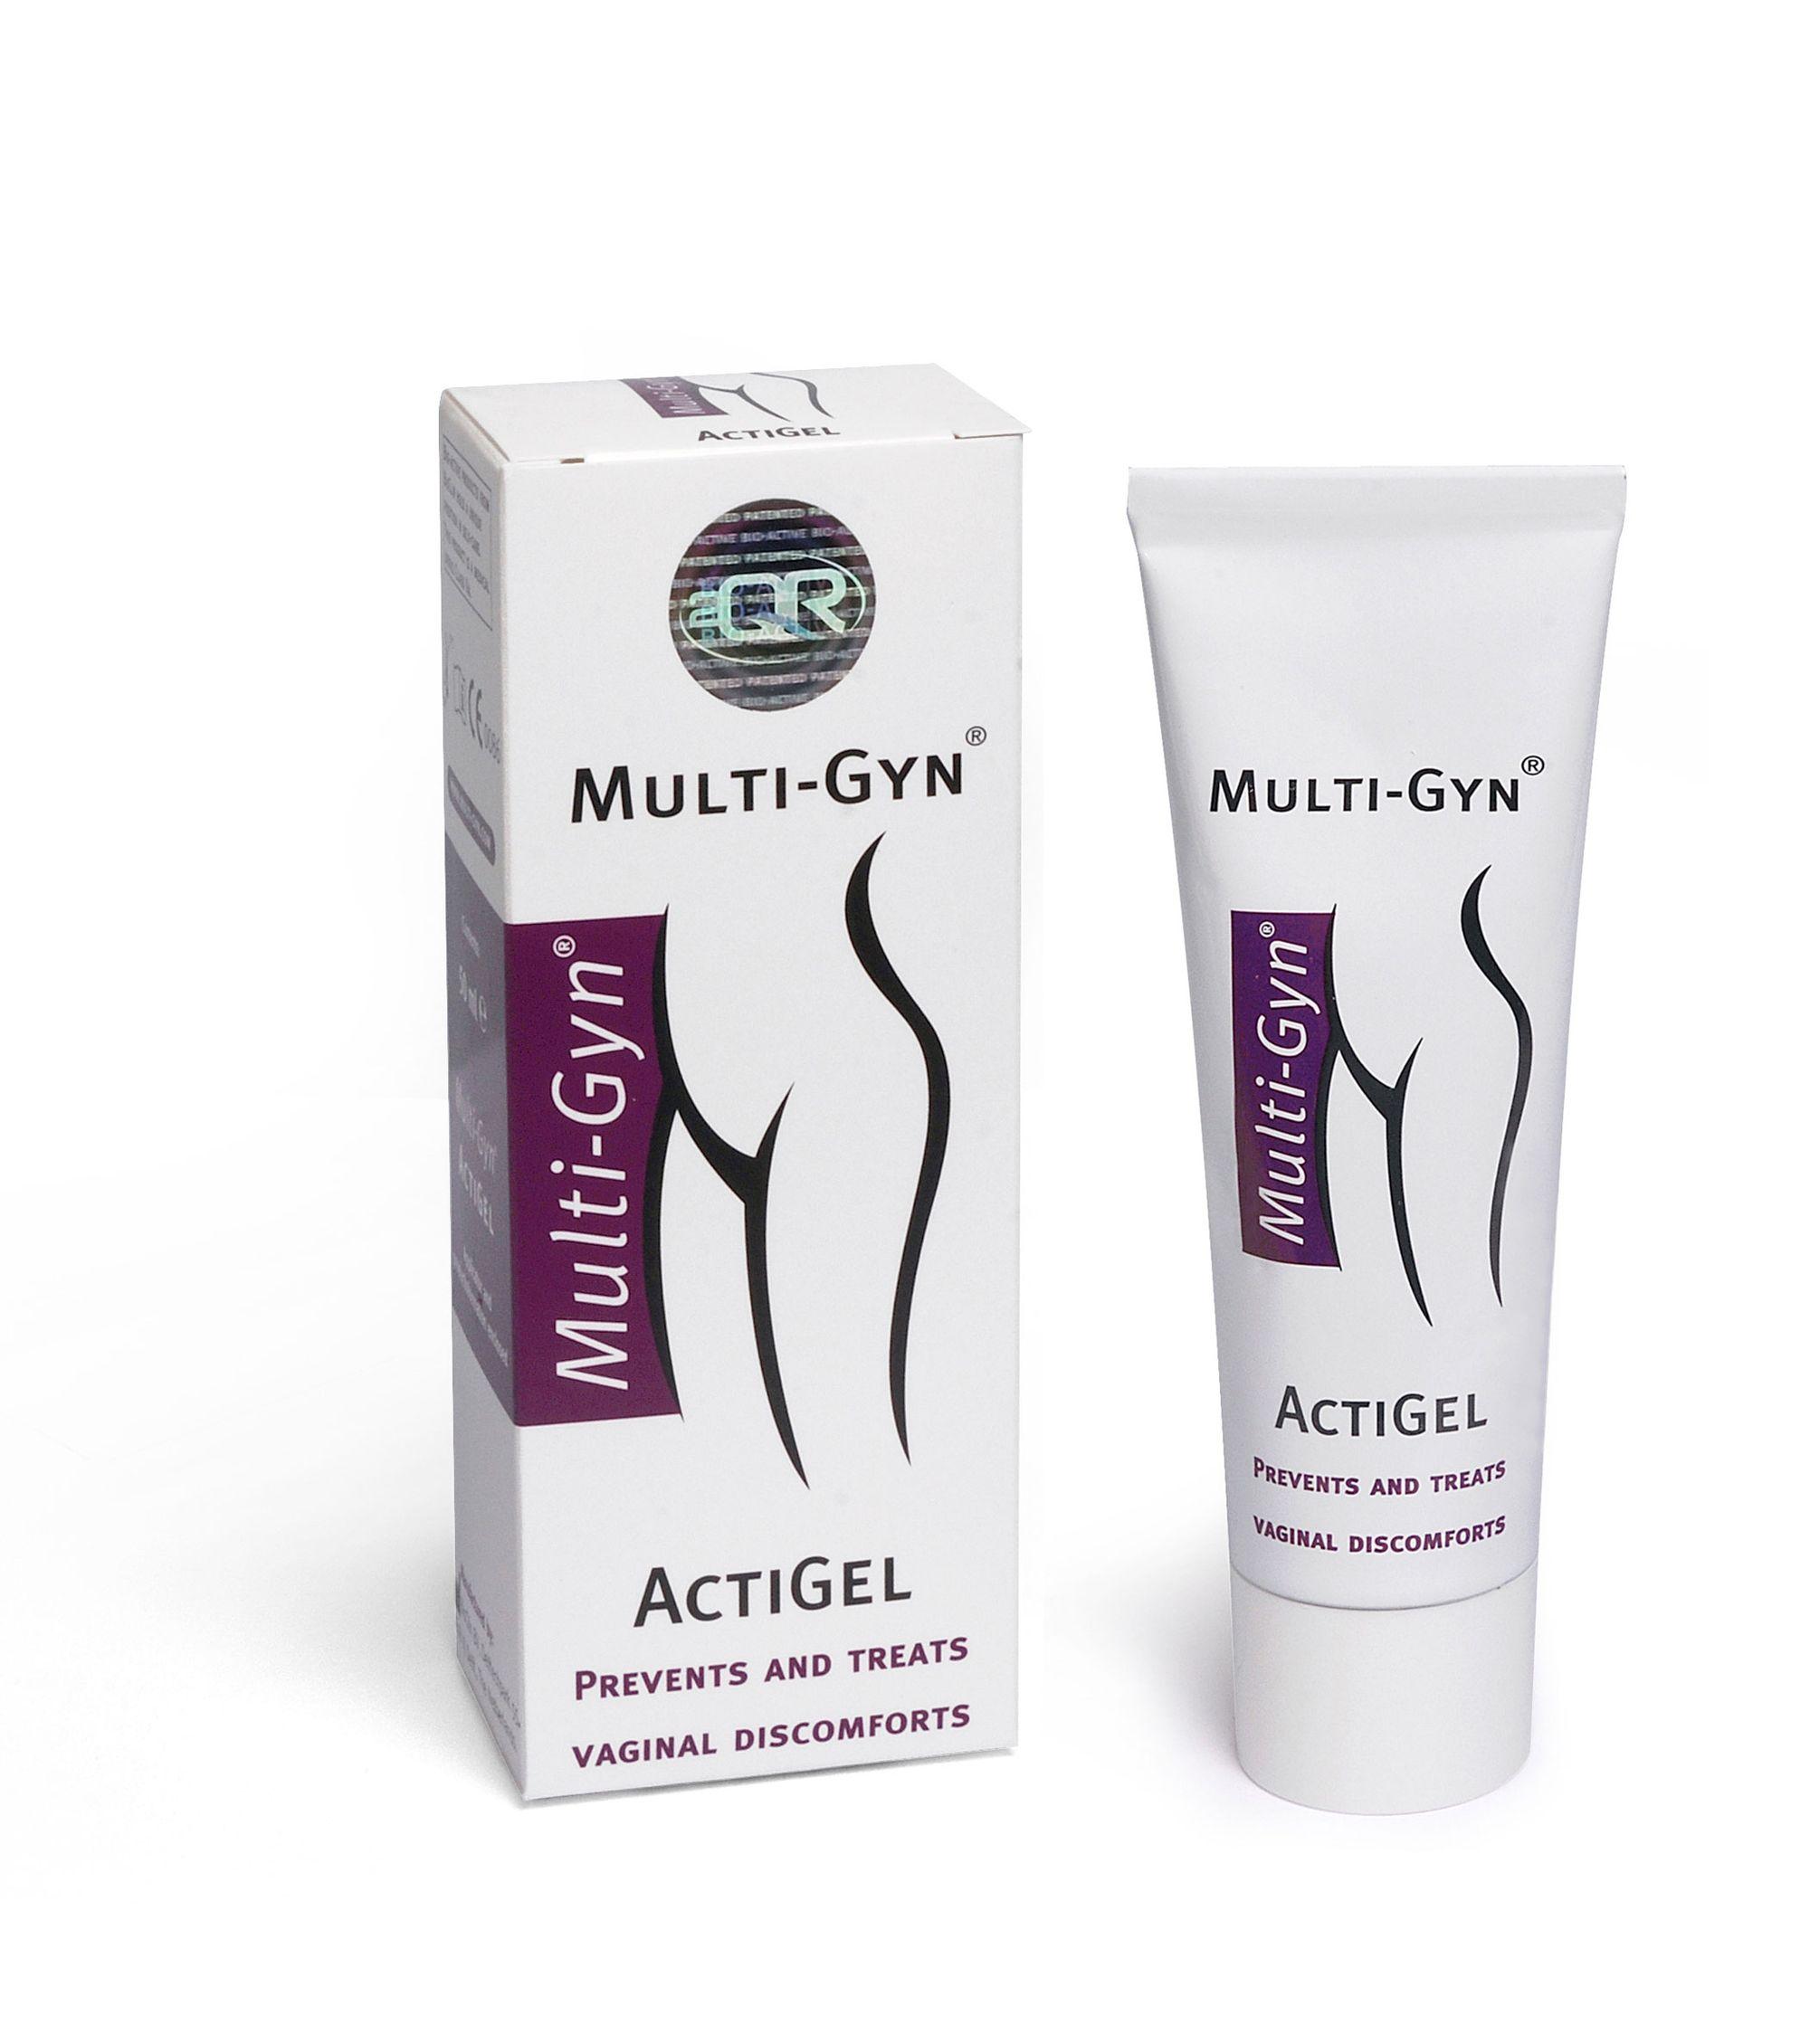 Multi-Gyn Actigel гель вагинальный, гель вагинальный, 50 мл, 1 шт.